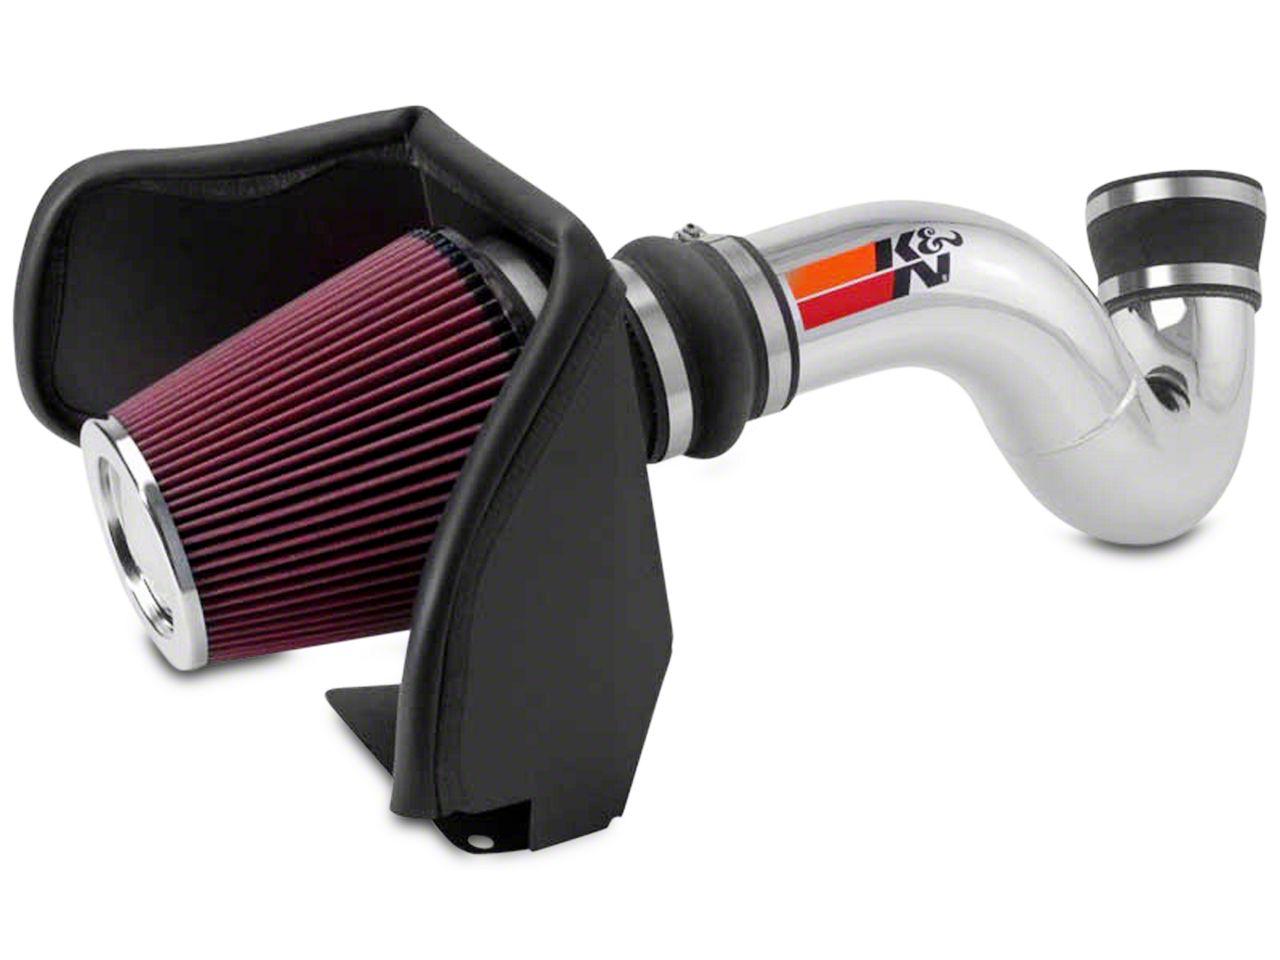 K&N Series 77 High Flow Performance Cold Air Intake (05-06 6.0L Silverado 1500 SS)